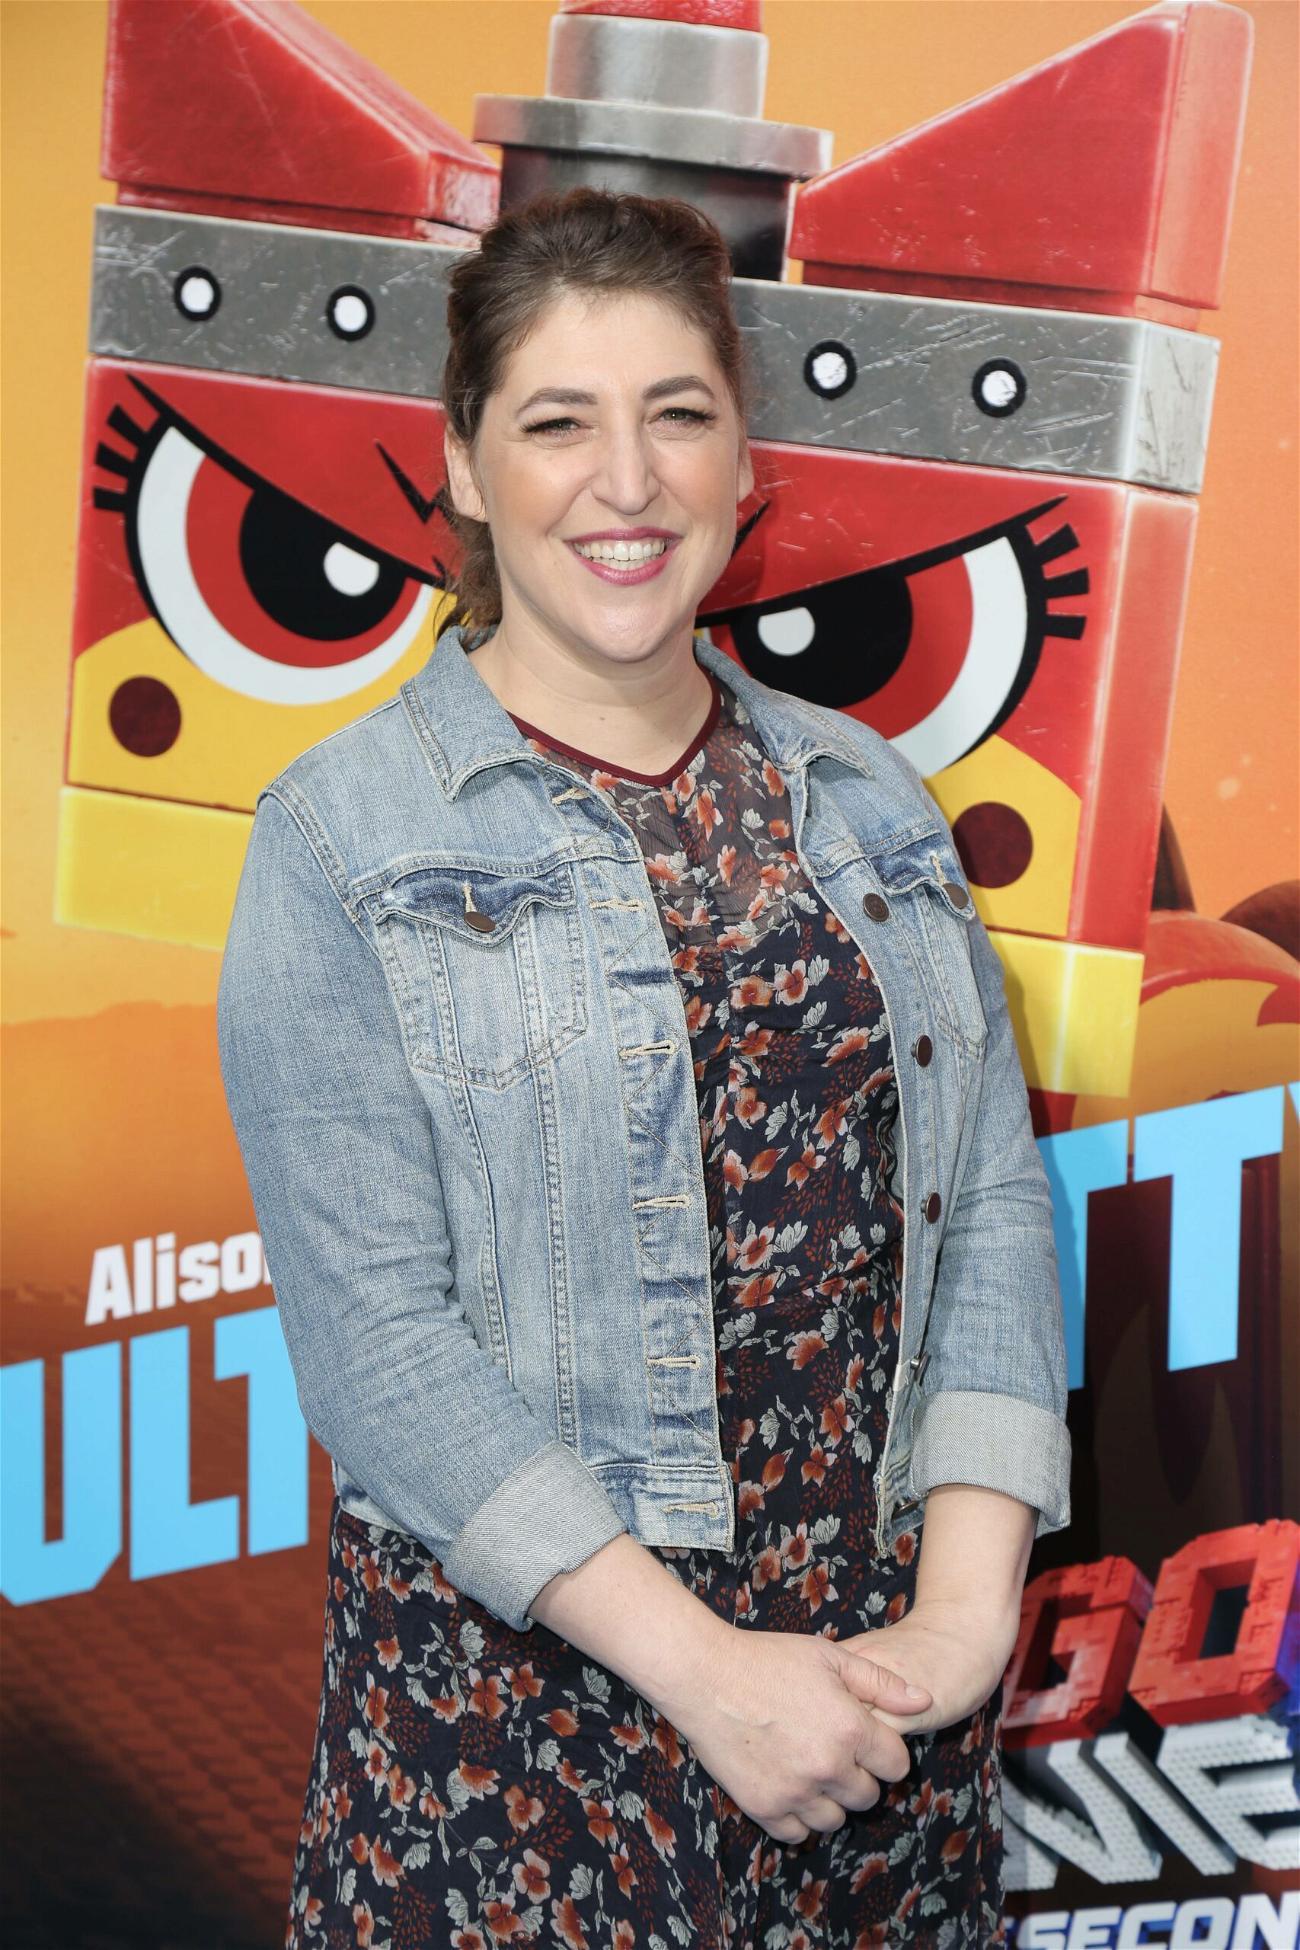 'Big Bang Theory' Star Mayim Bialik Co-Hosting Jeopardy!